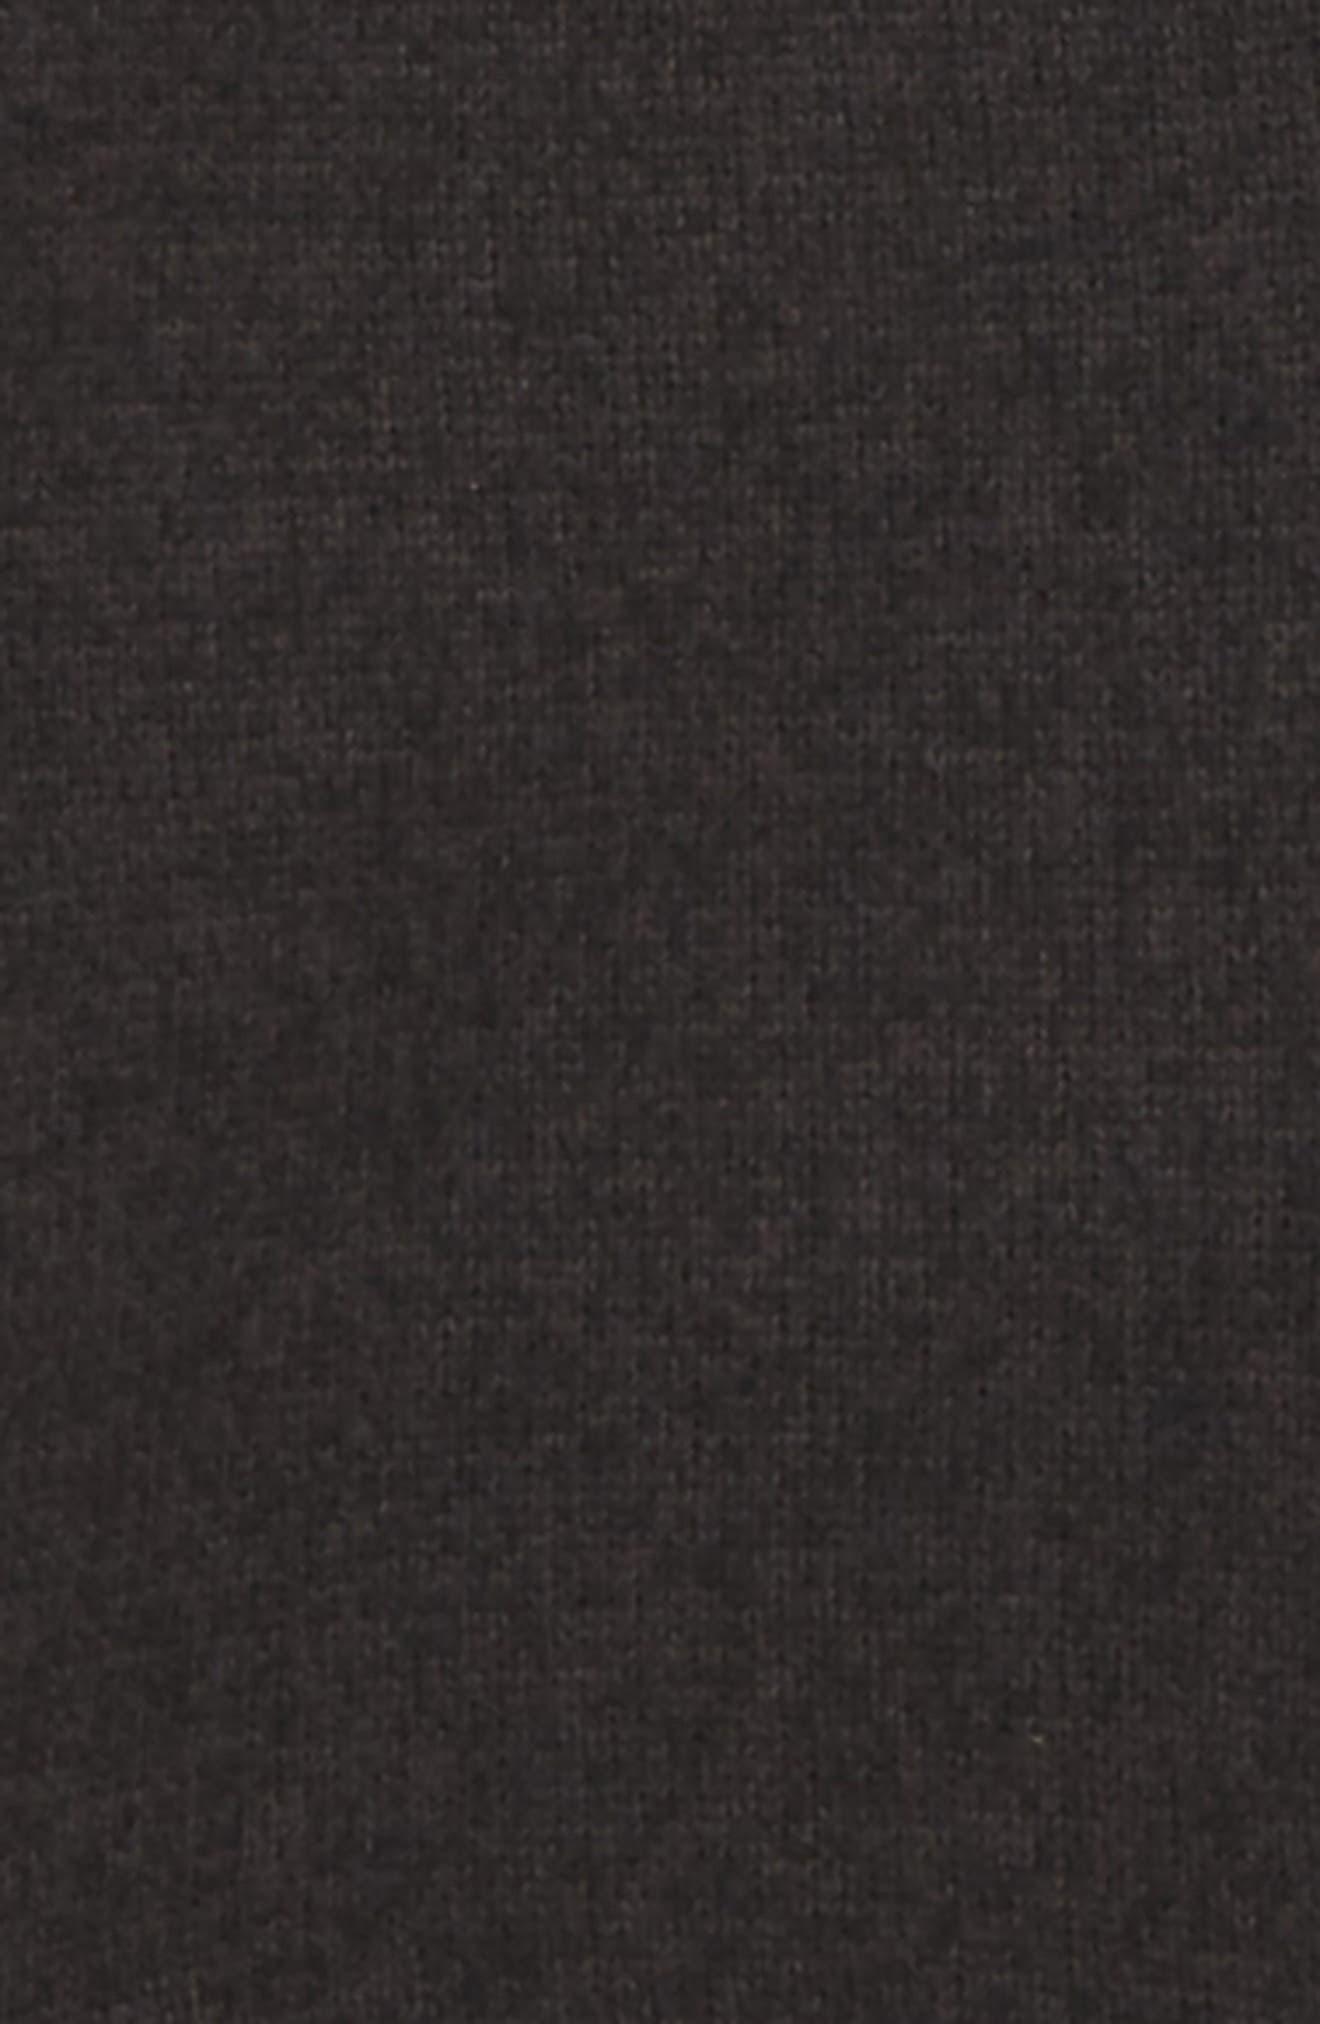 Gordon Lyons Sweater Fleece Zip Jacket,                             Alternate thumbnail 2, color,                             NO_COLOR